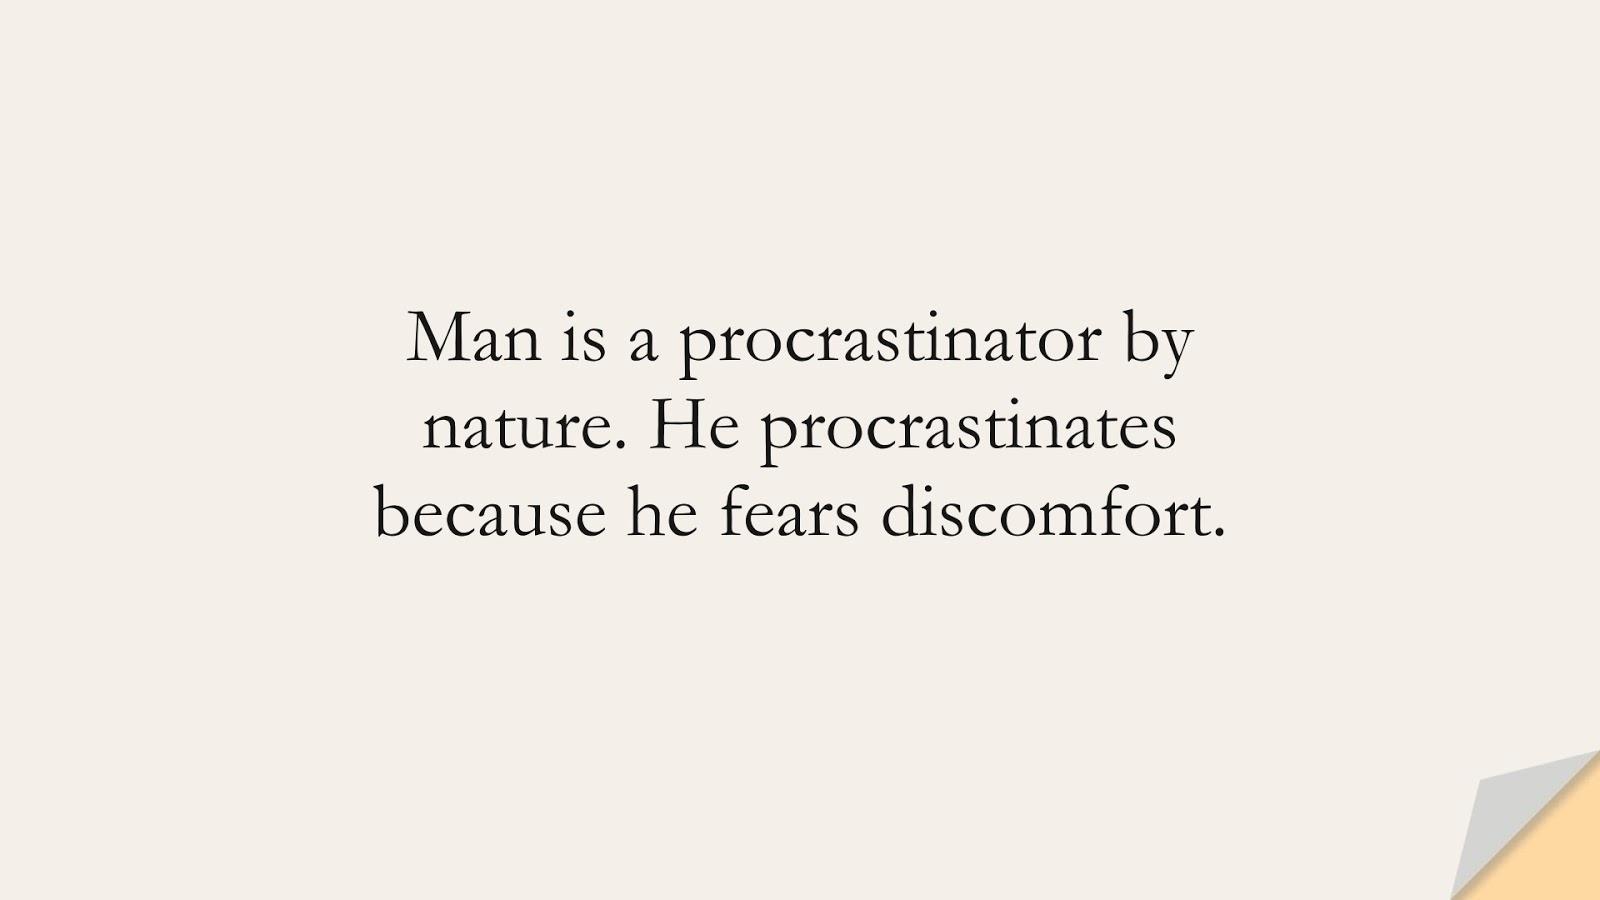 Man is a procrastinator by nature. He procrastinates because he fears discomfort.FALSE